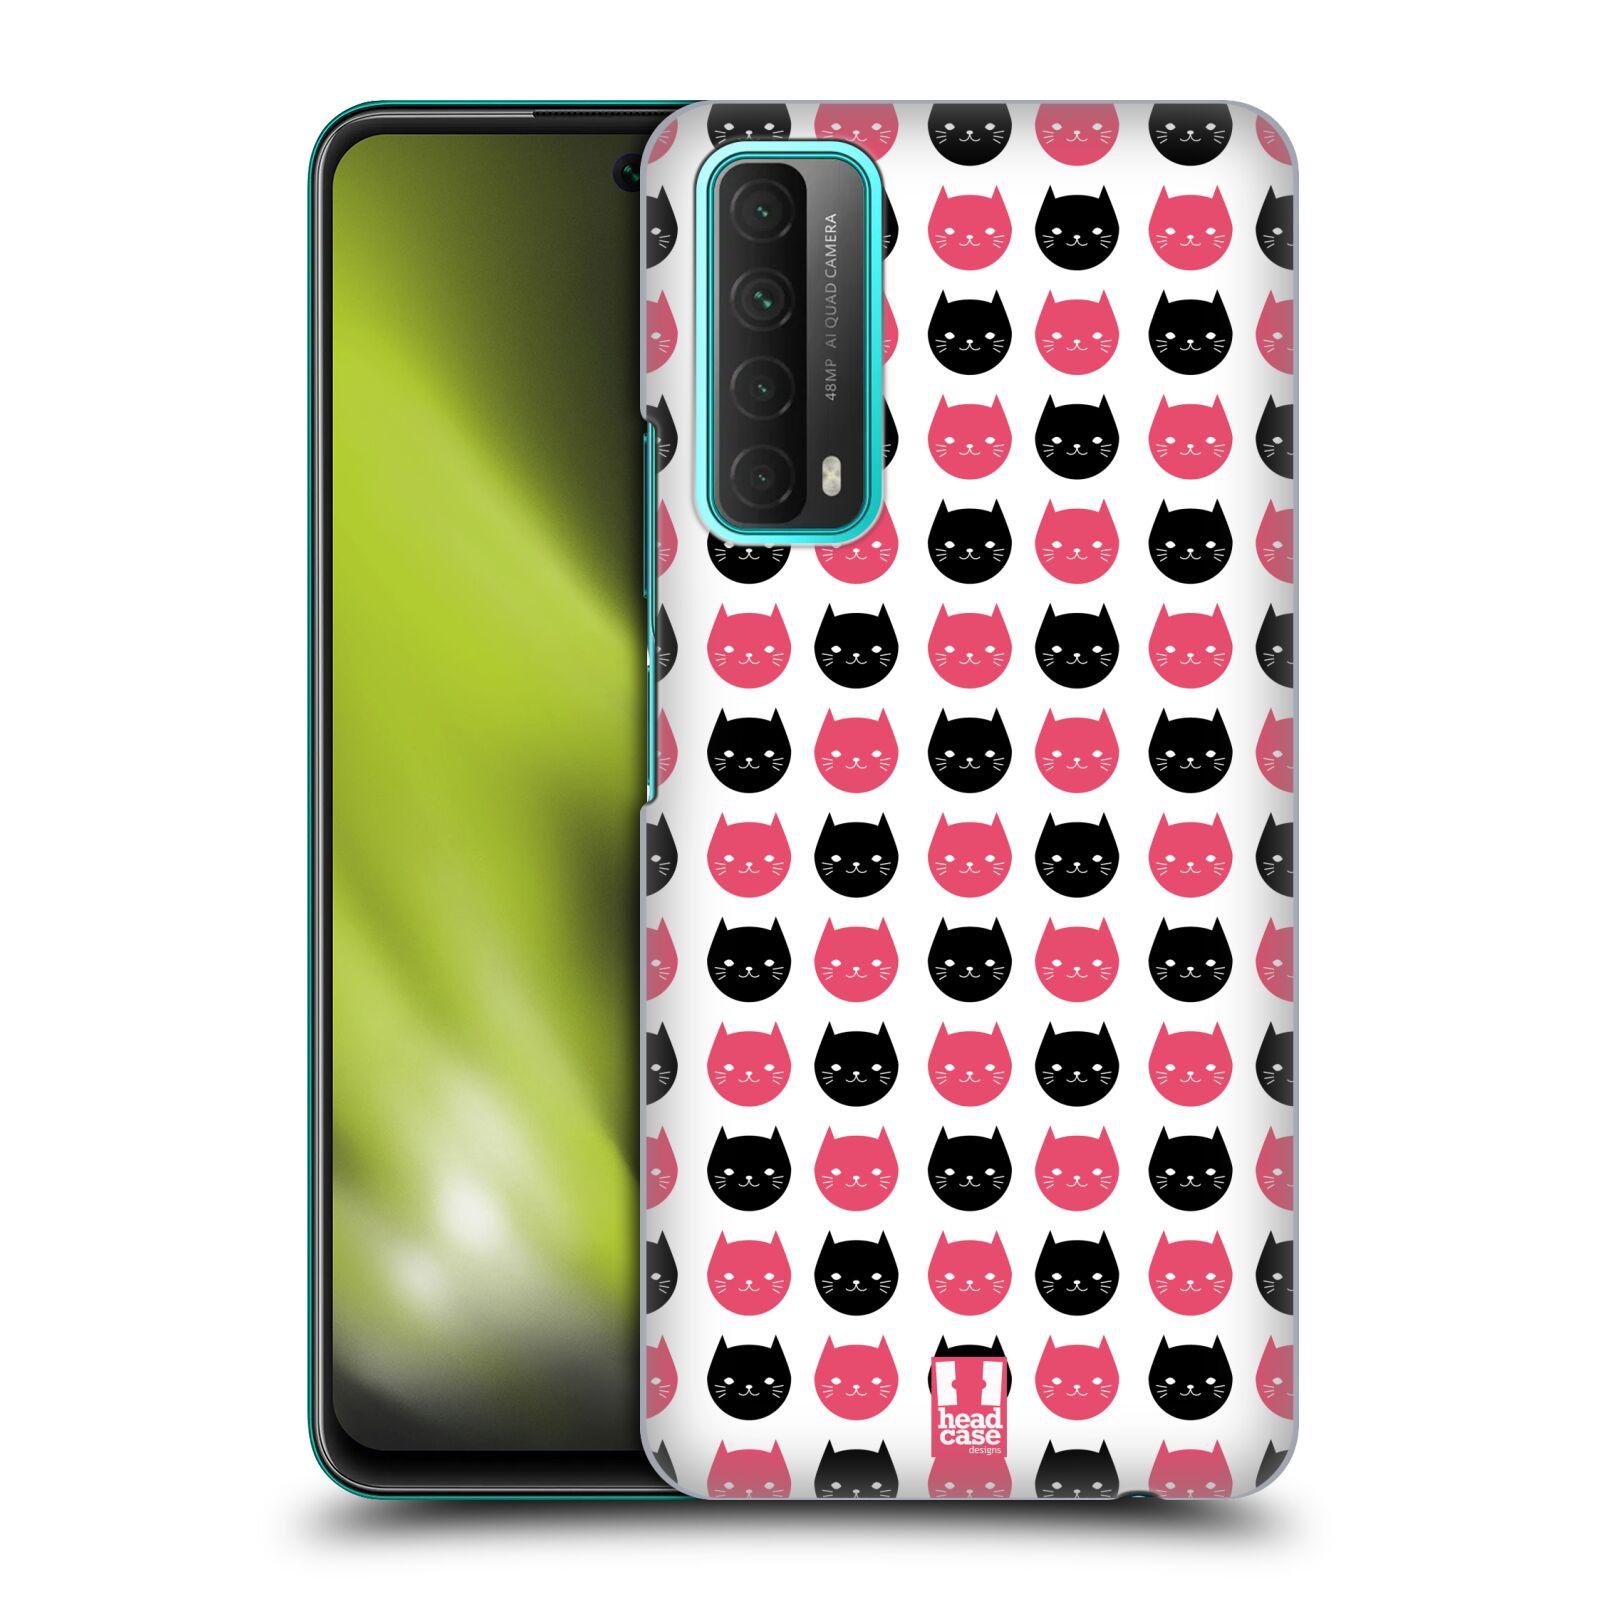 Plastové pouzdro na mobil Huawei P Smart (2021) - Head Case - KOČKY Black and Pink